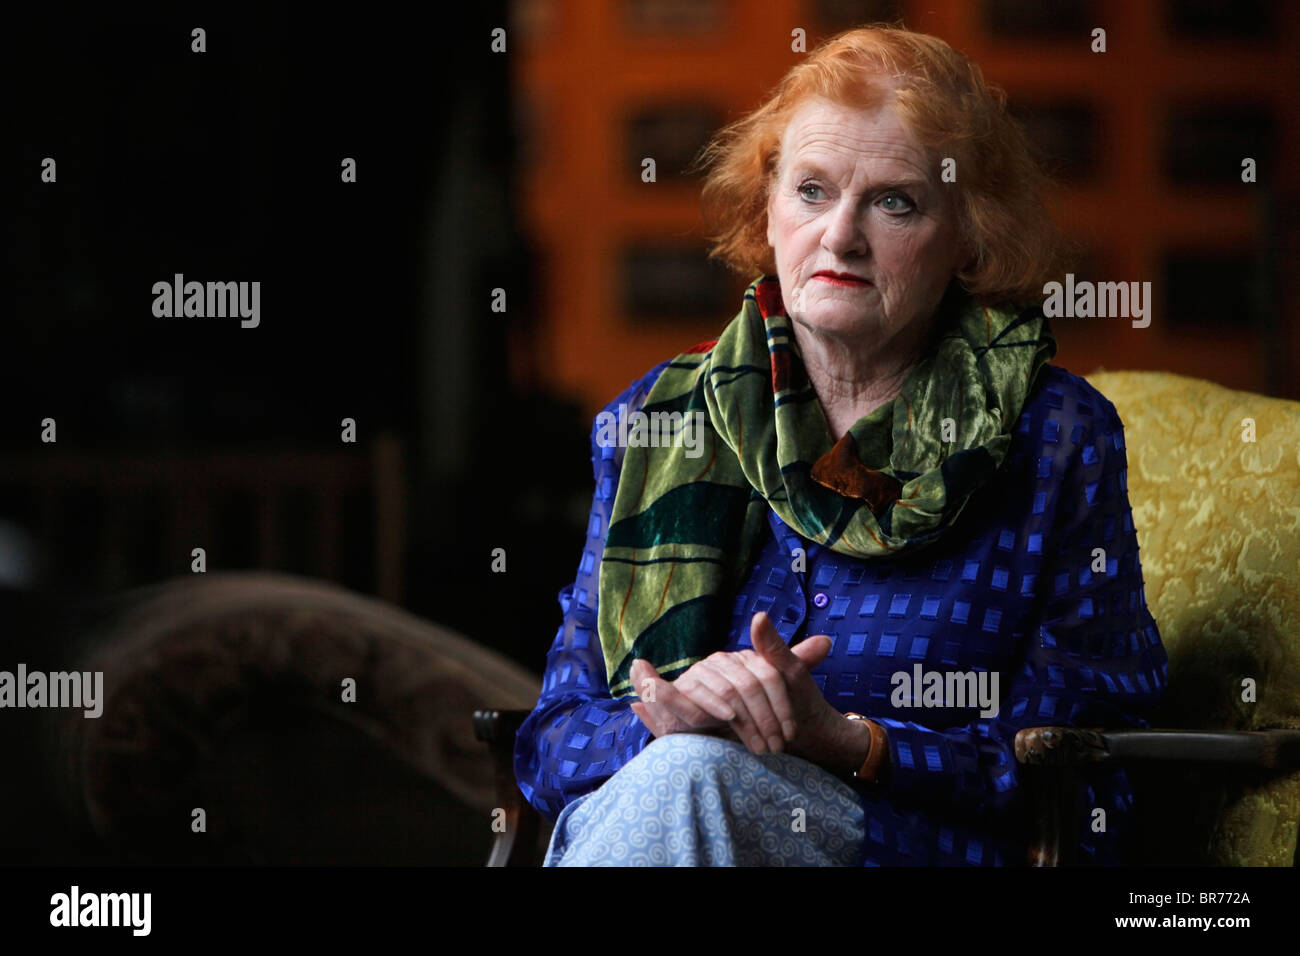 Irish Woman In Contemplation - Stock Image